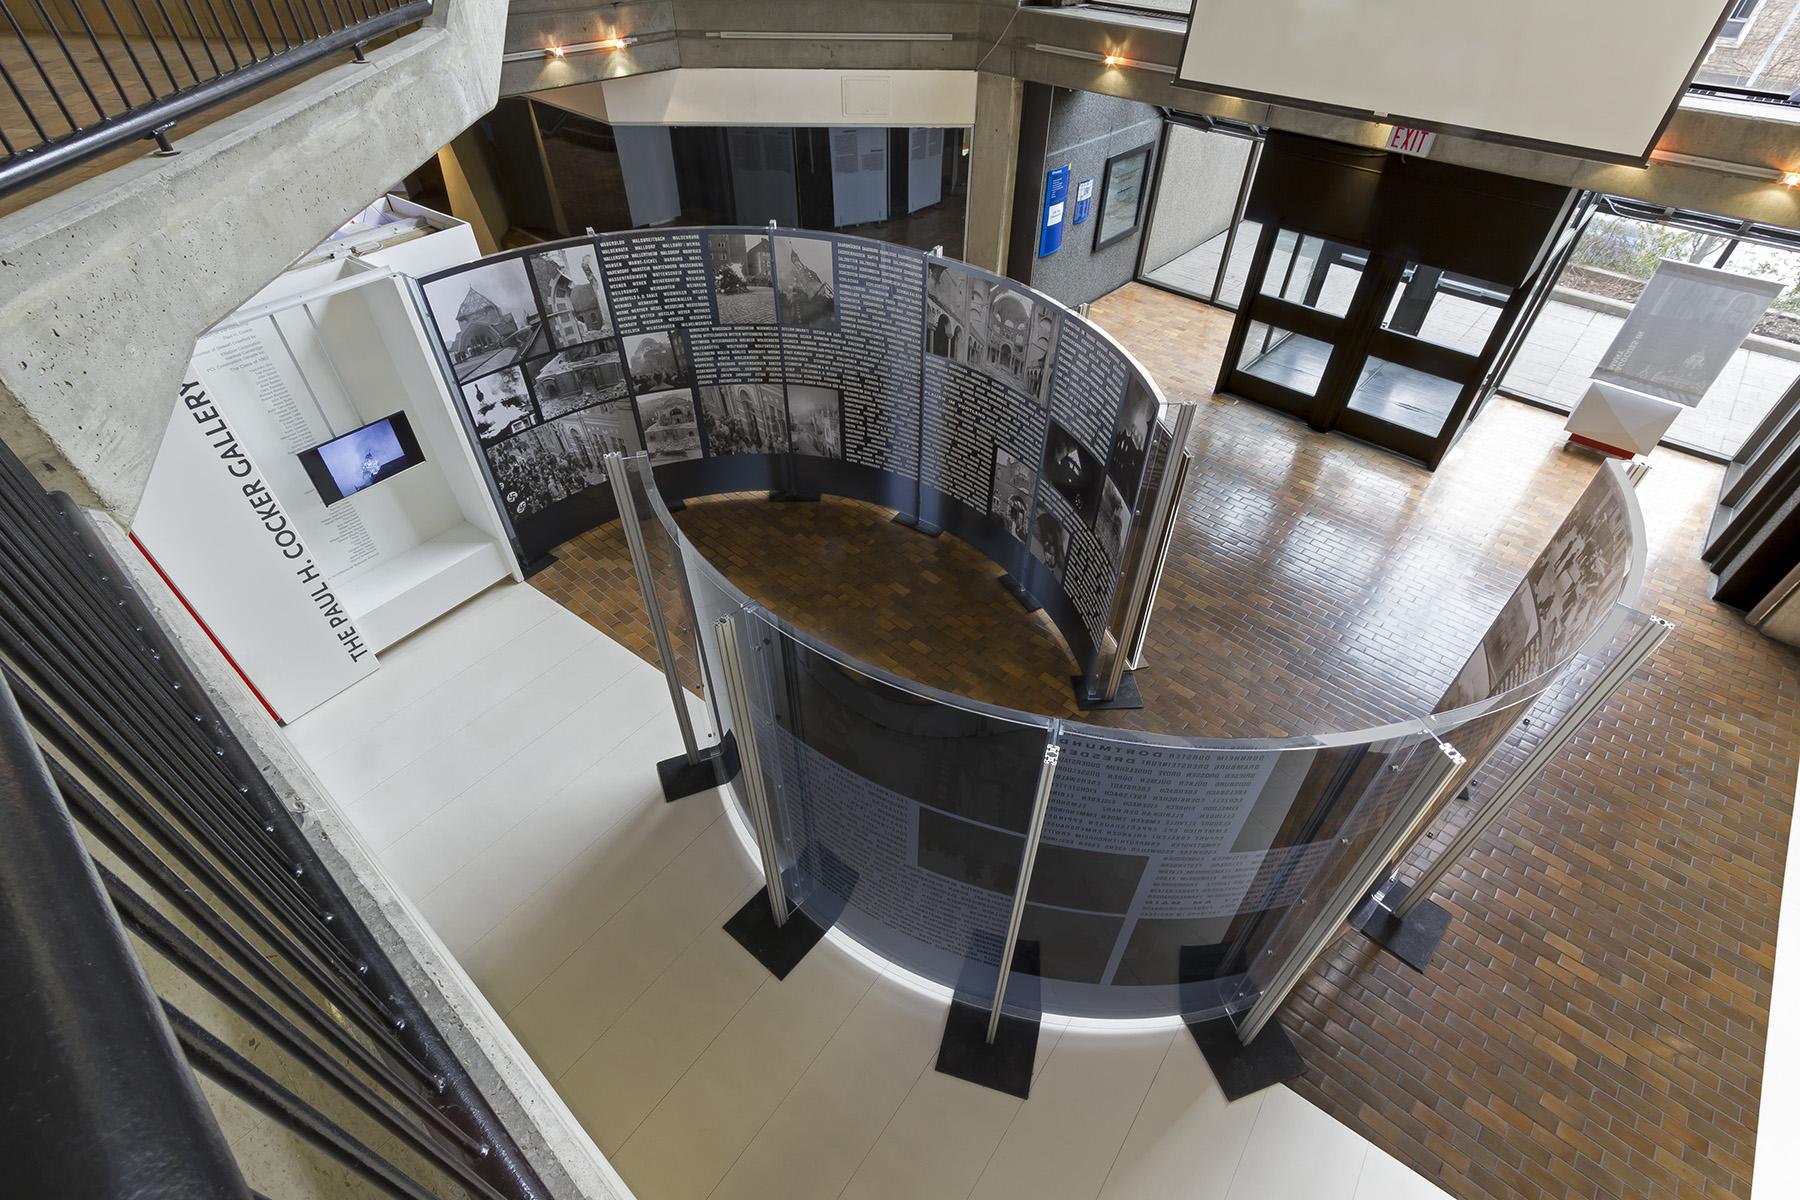 Paul H. Cocker Gallery, Ryerson University